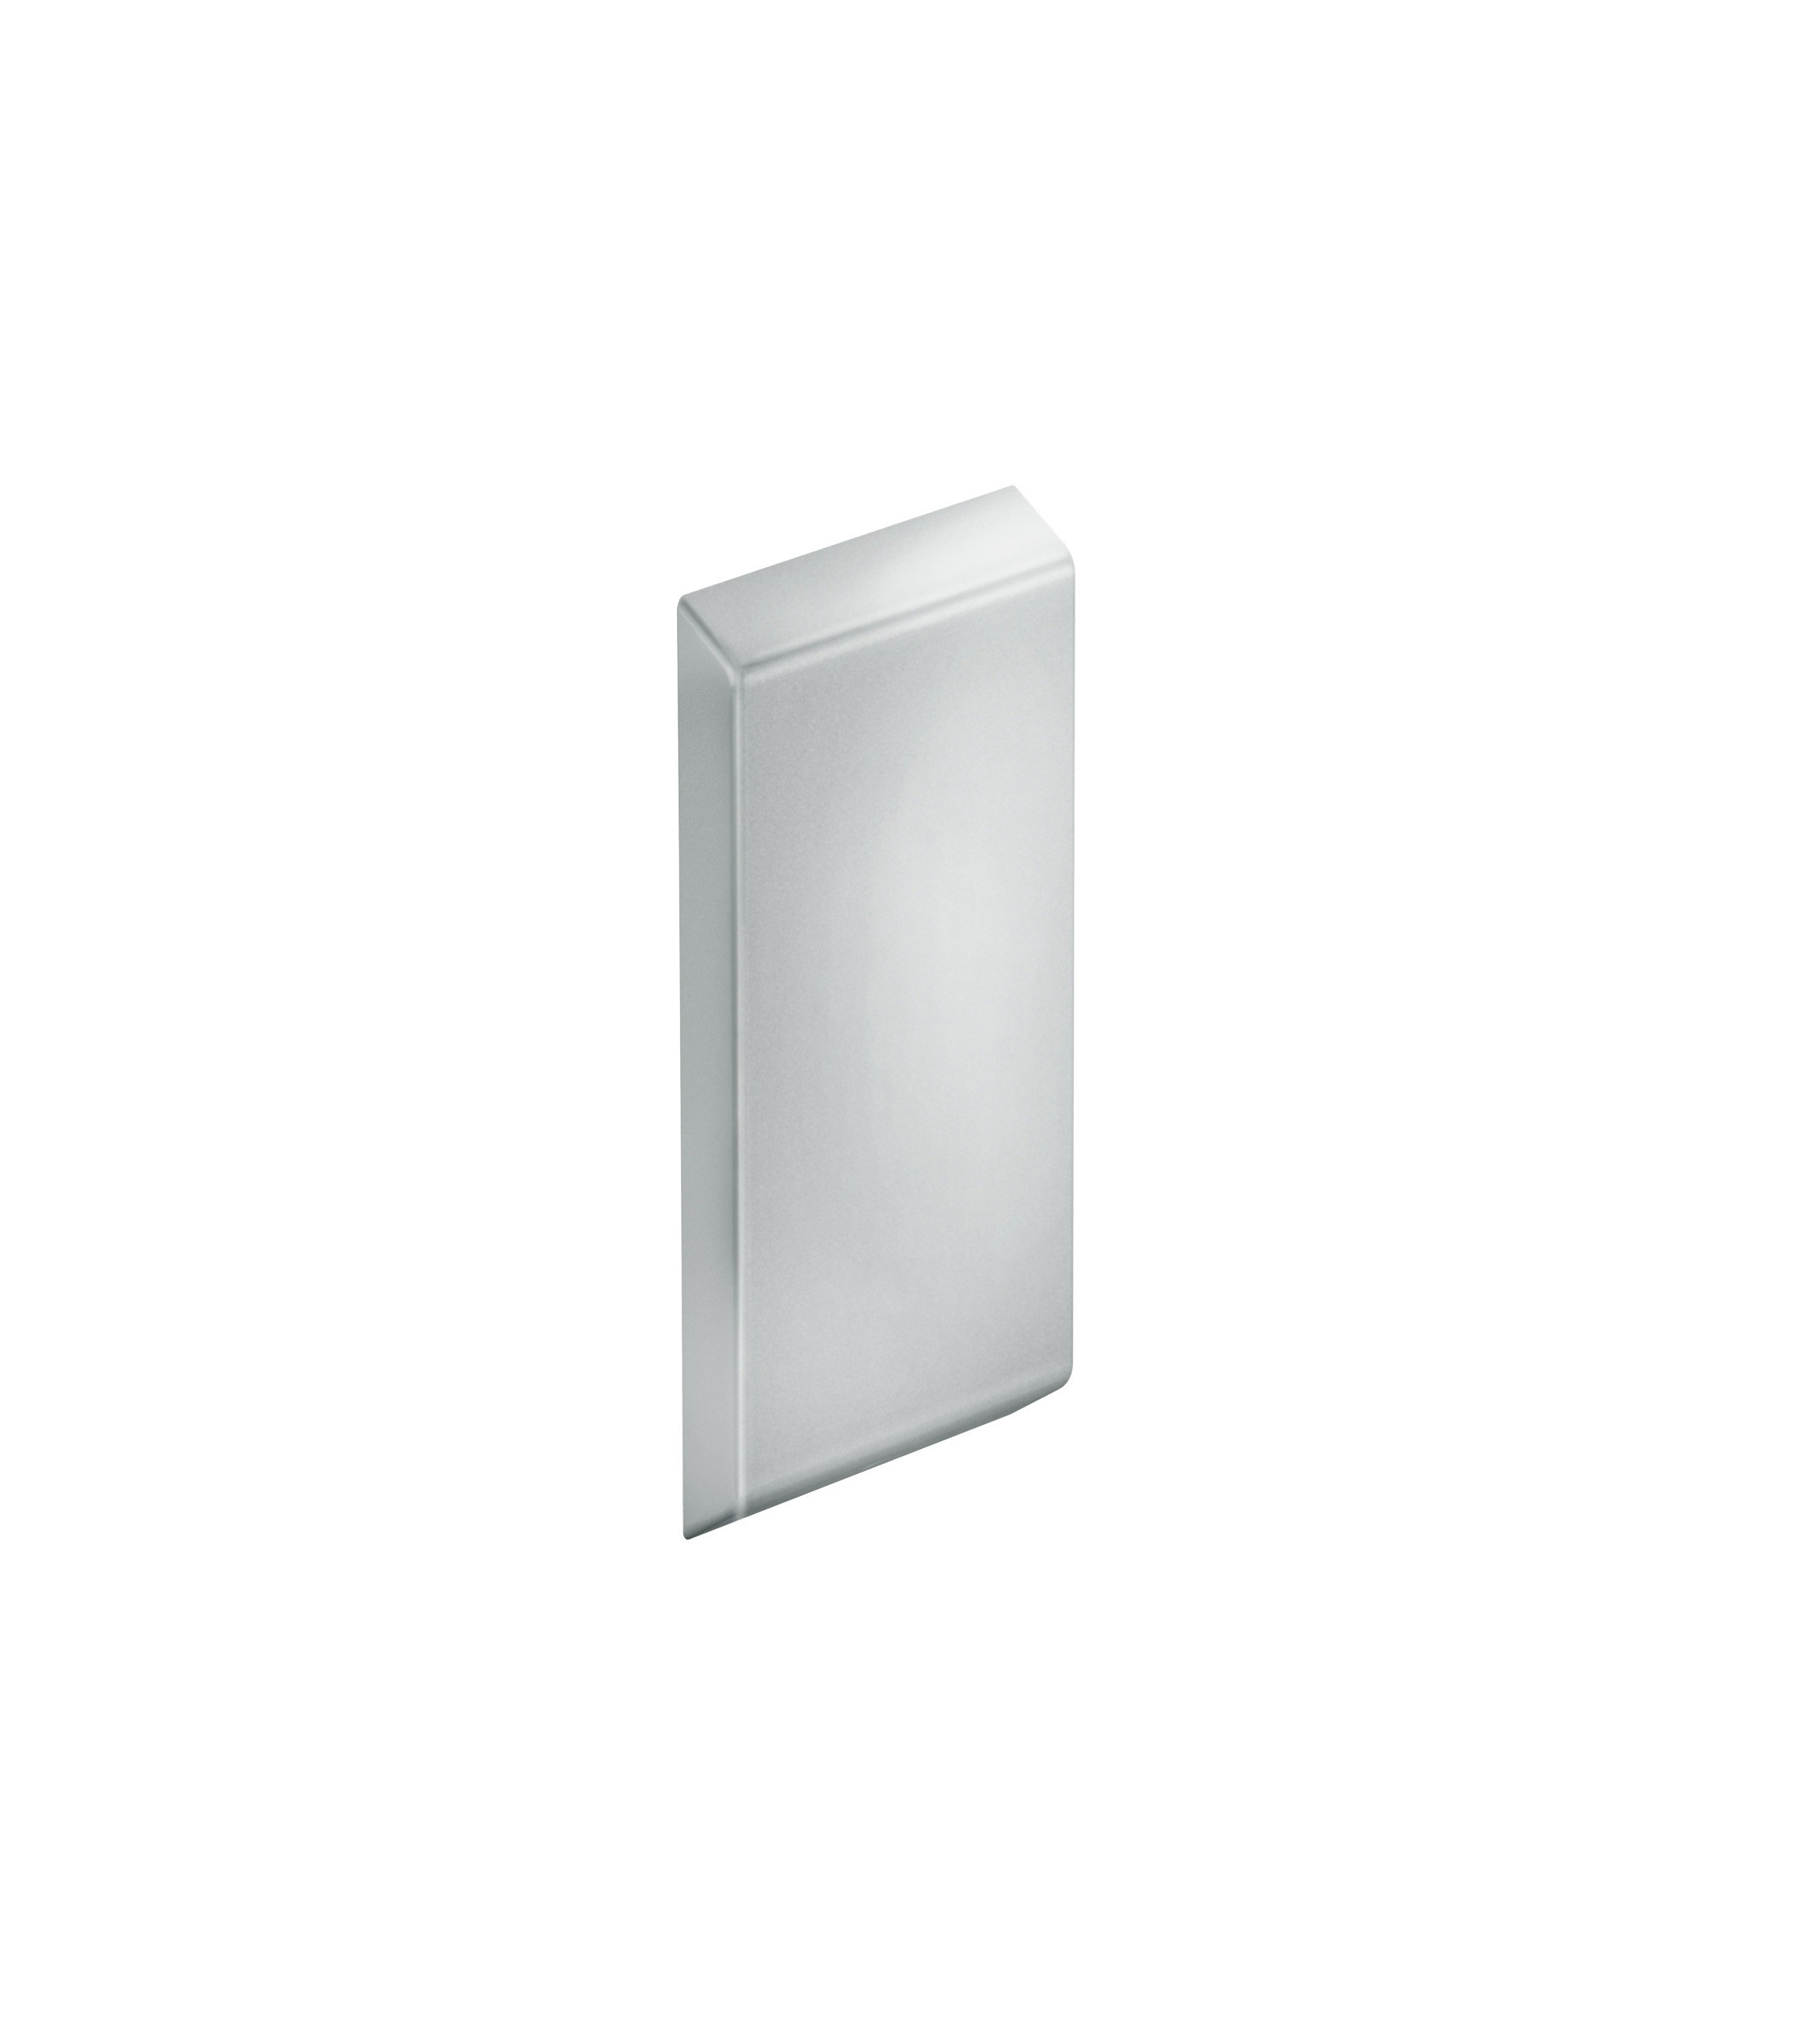 FSB Abdeckplatte ohne Trägerplatte A100 Aluminiumgrau metallinksc (0 82 8421 00001 8829)